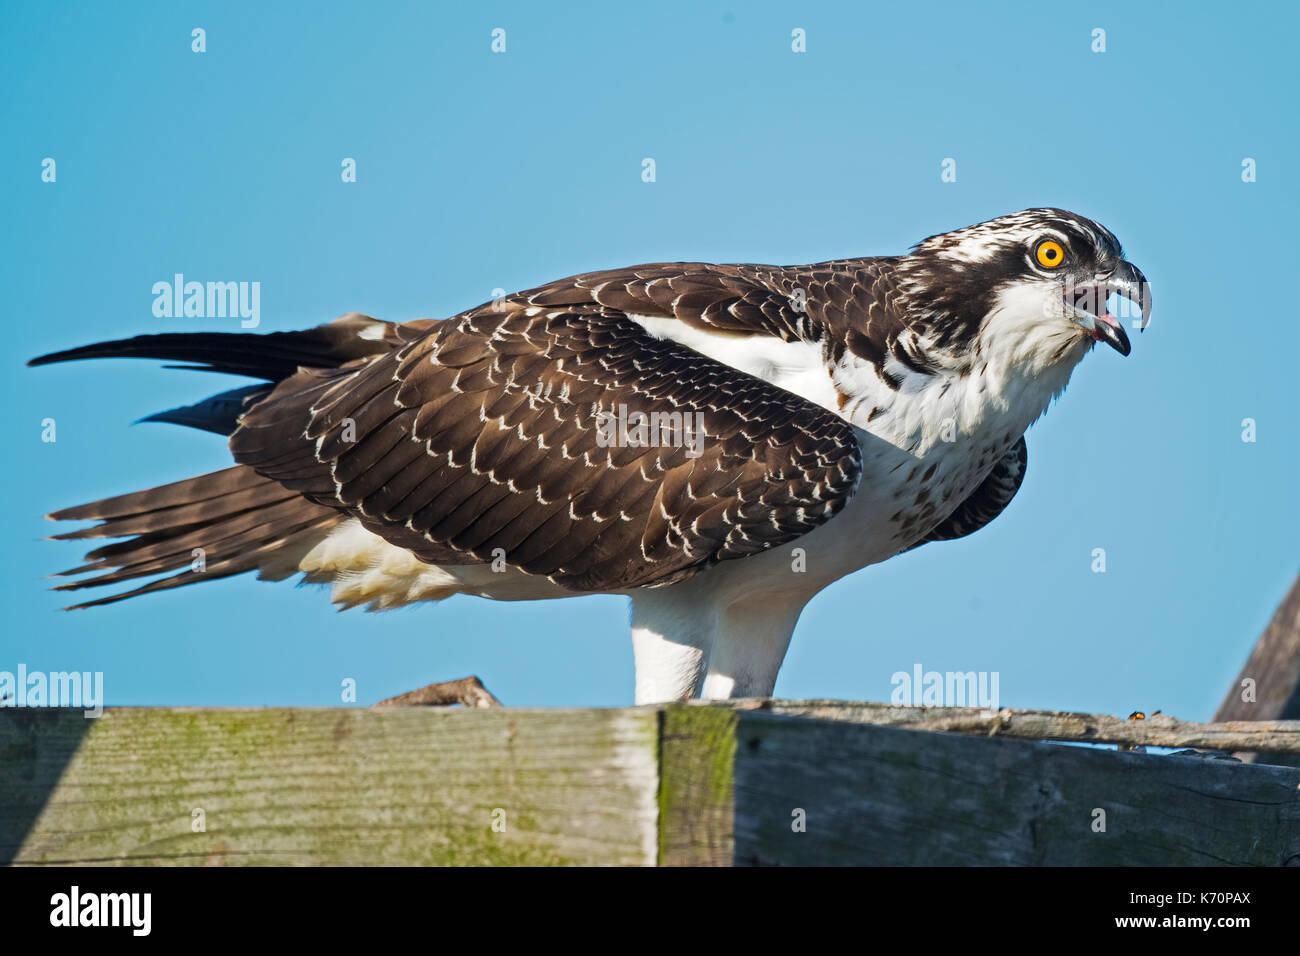 Juvenile Osprey - Stock Image